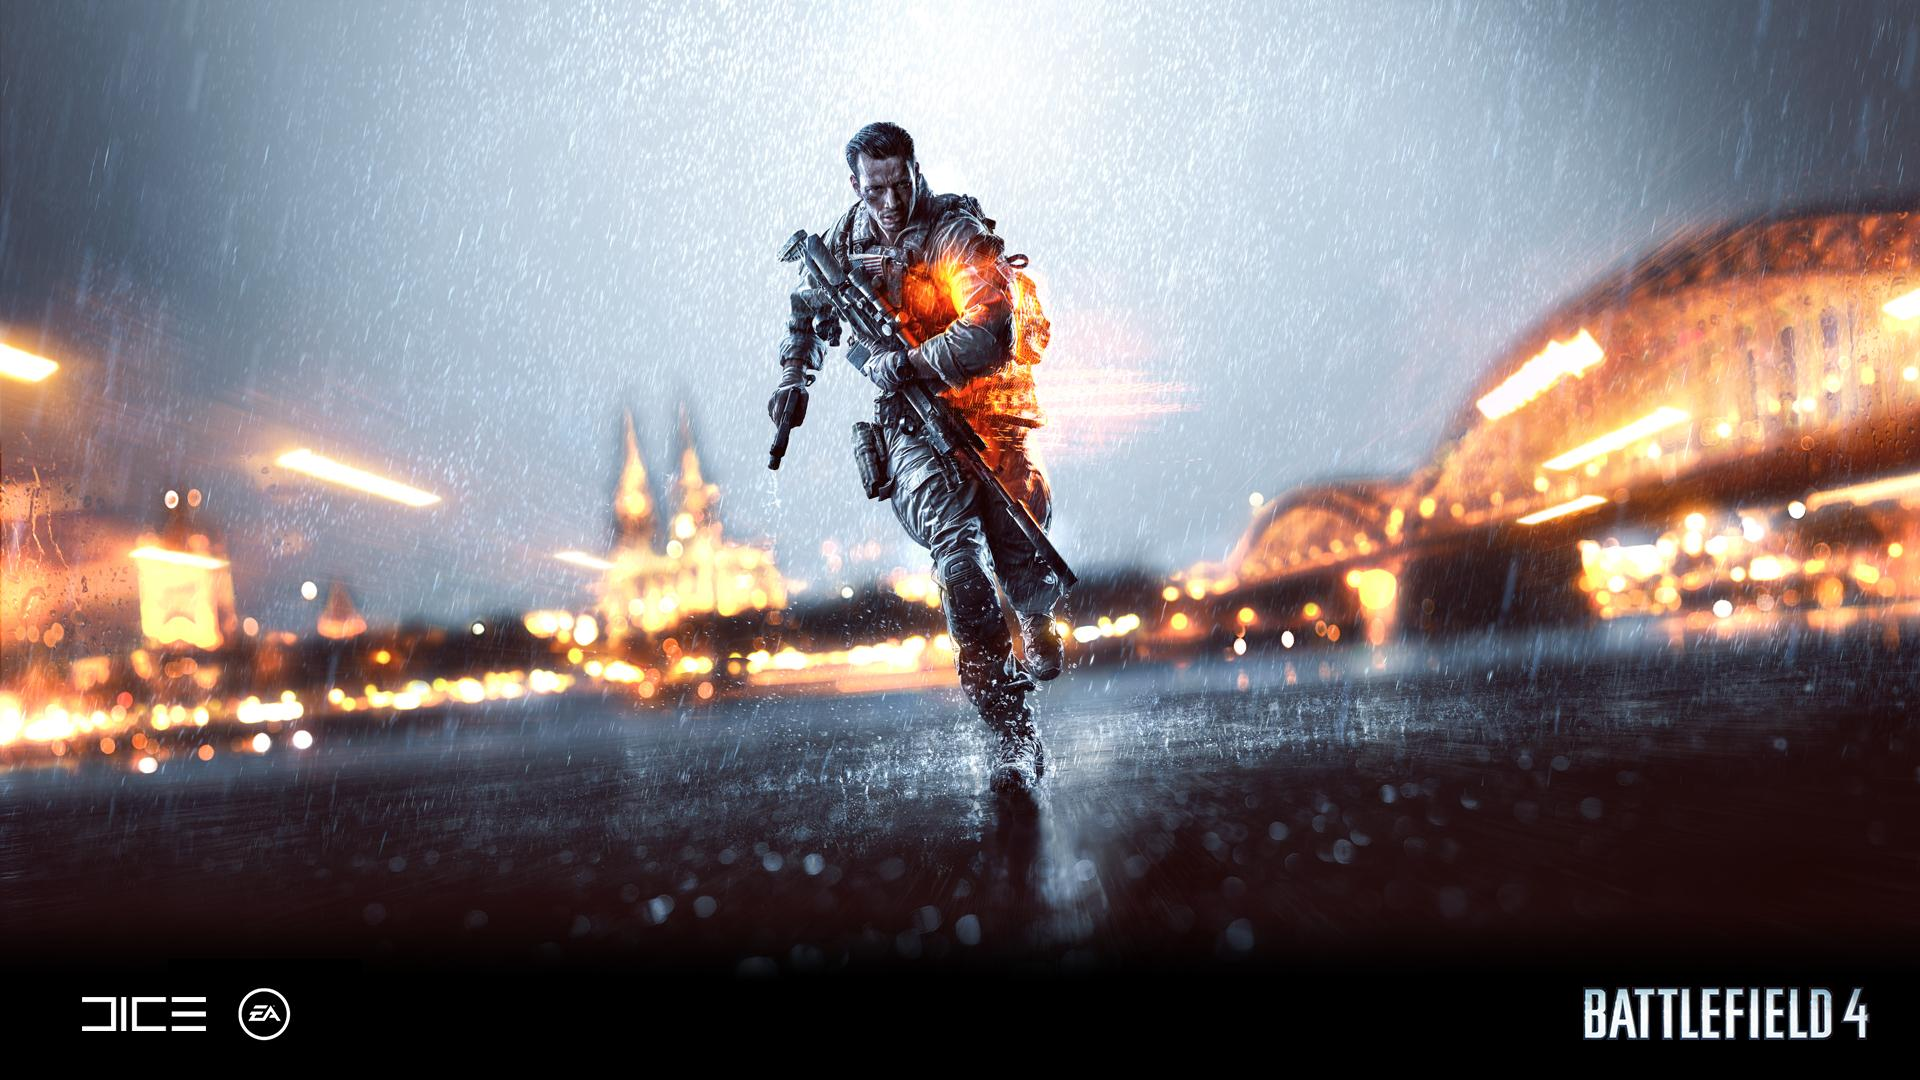 Battlefield 4 HD Wallpapers Group (88+)